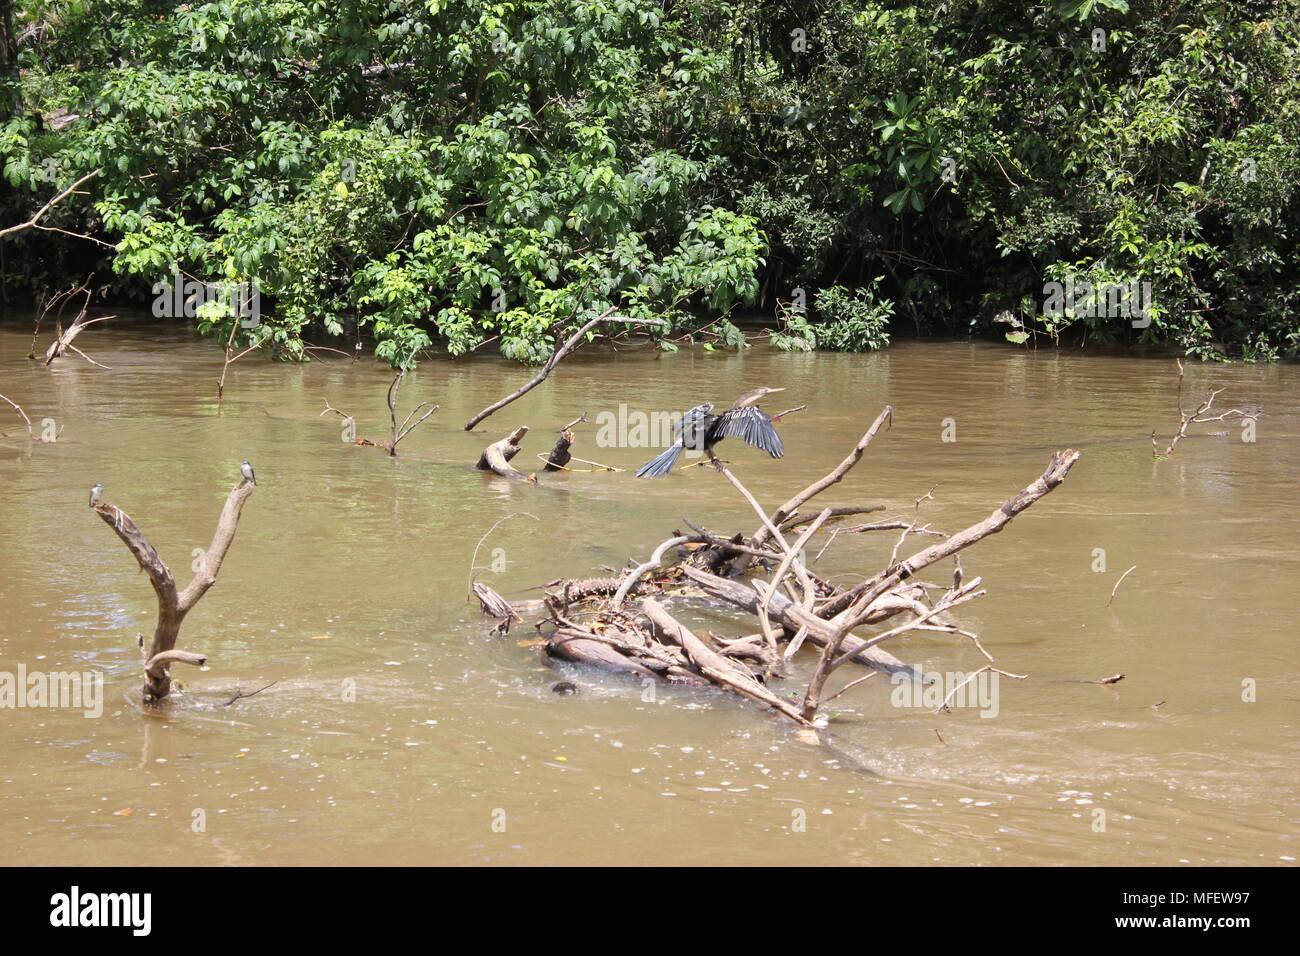 Caño Negro Wildlife Refuge, Alajuela Province, Costa Rica - Stock Image